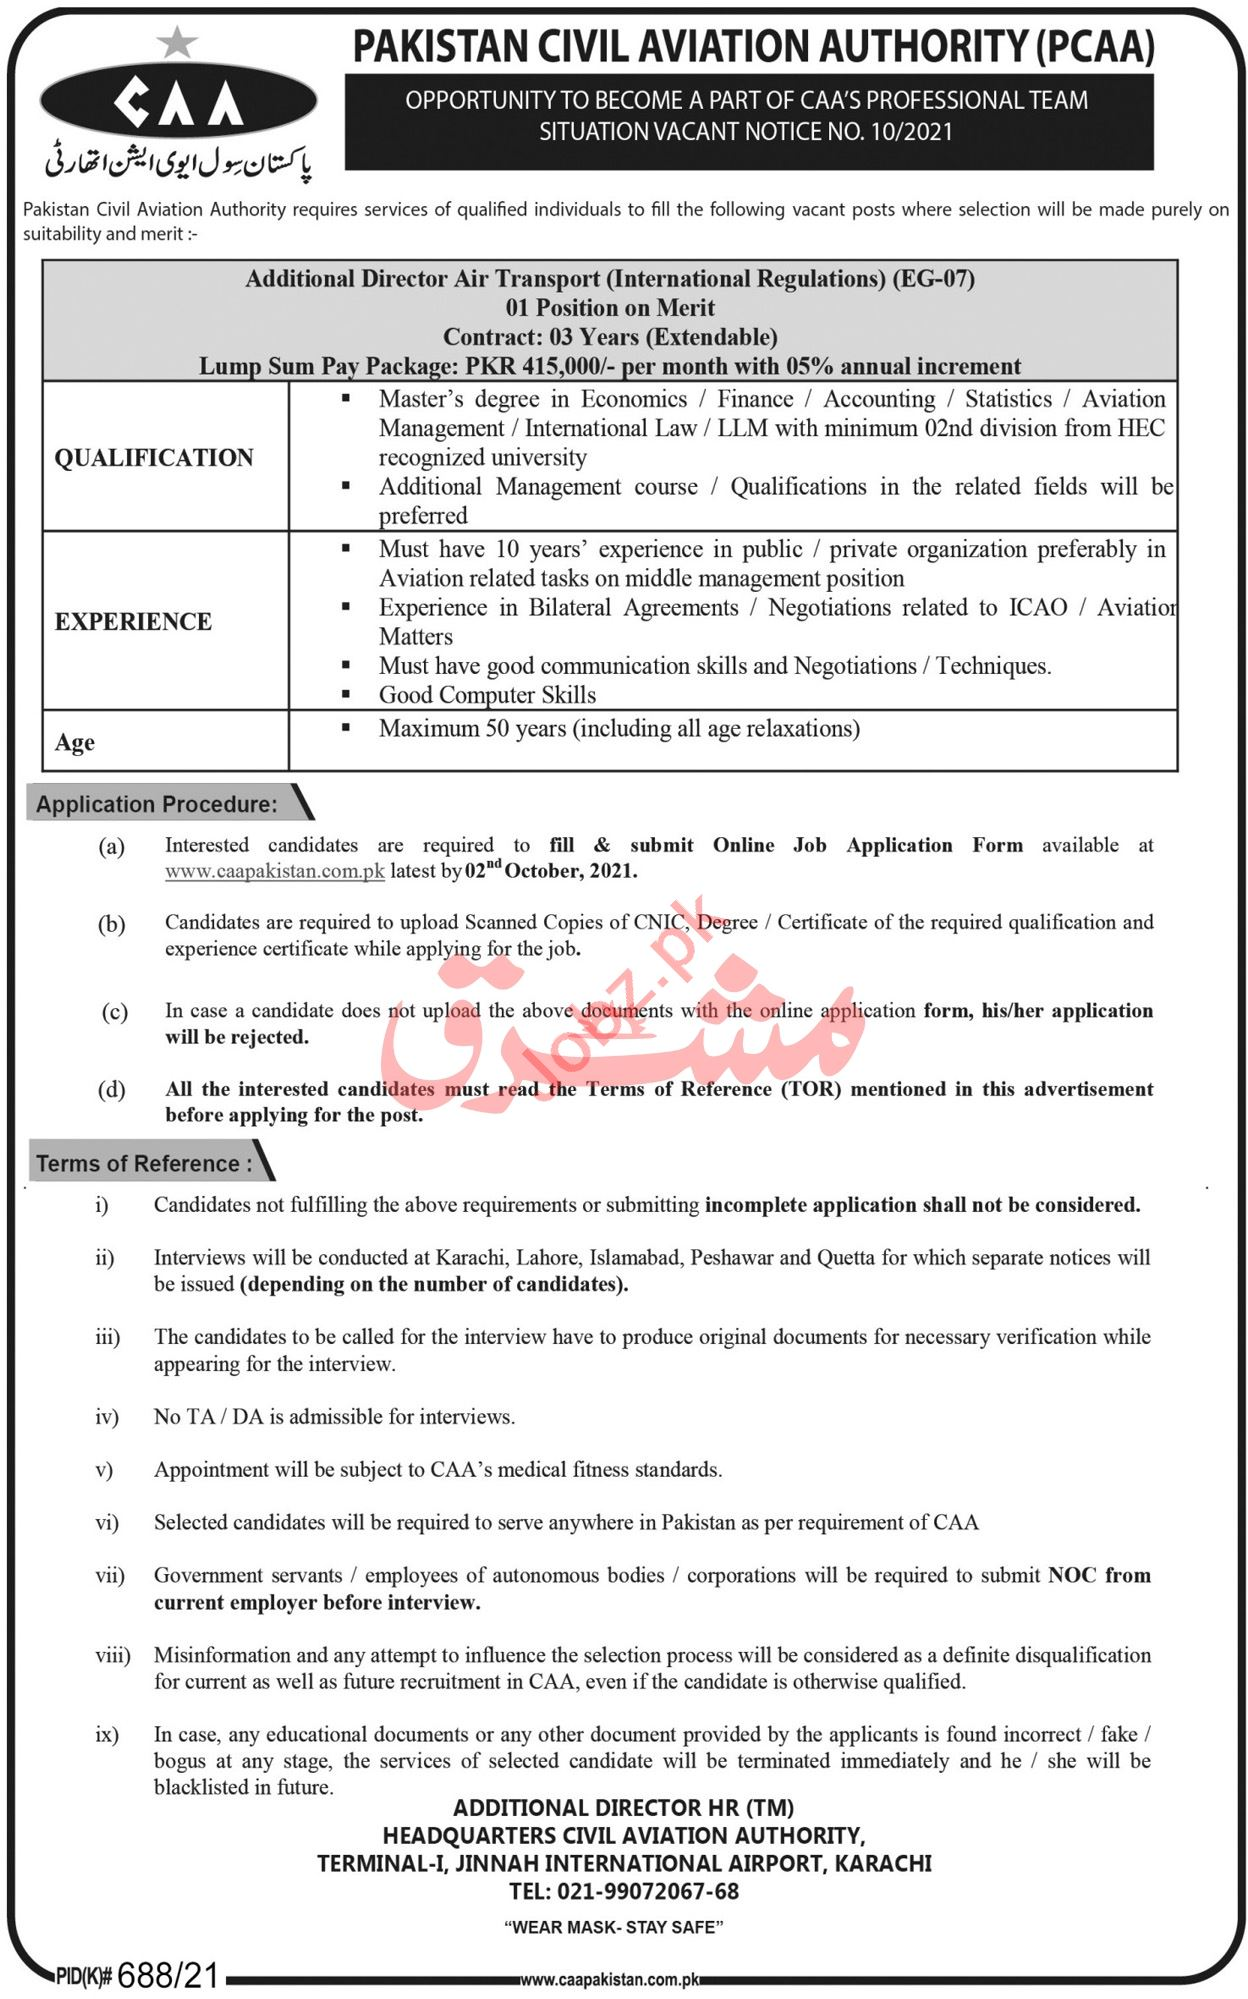 Pakistan Civil Aviation Authority Job 2021 In Karachi